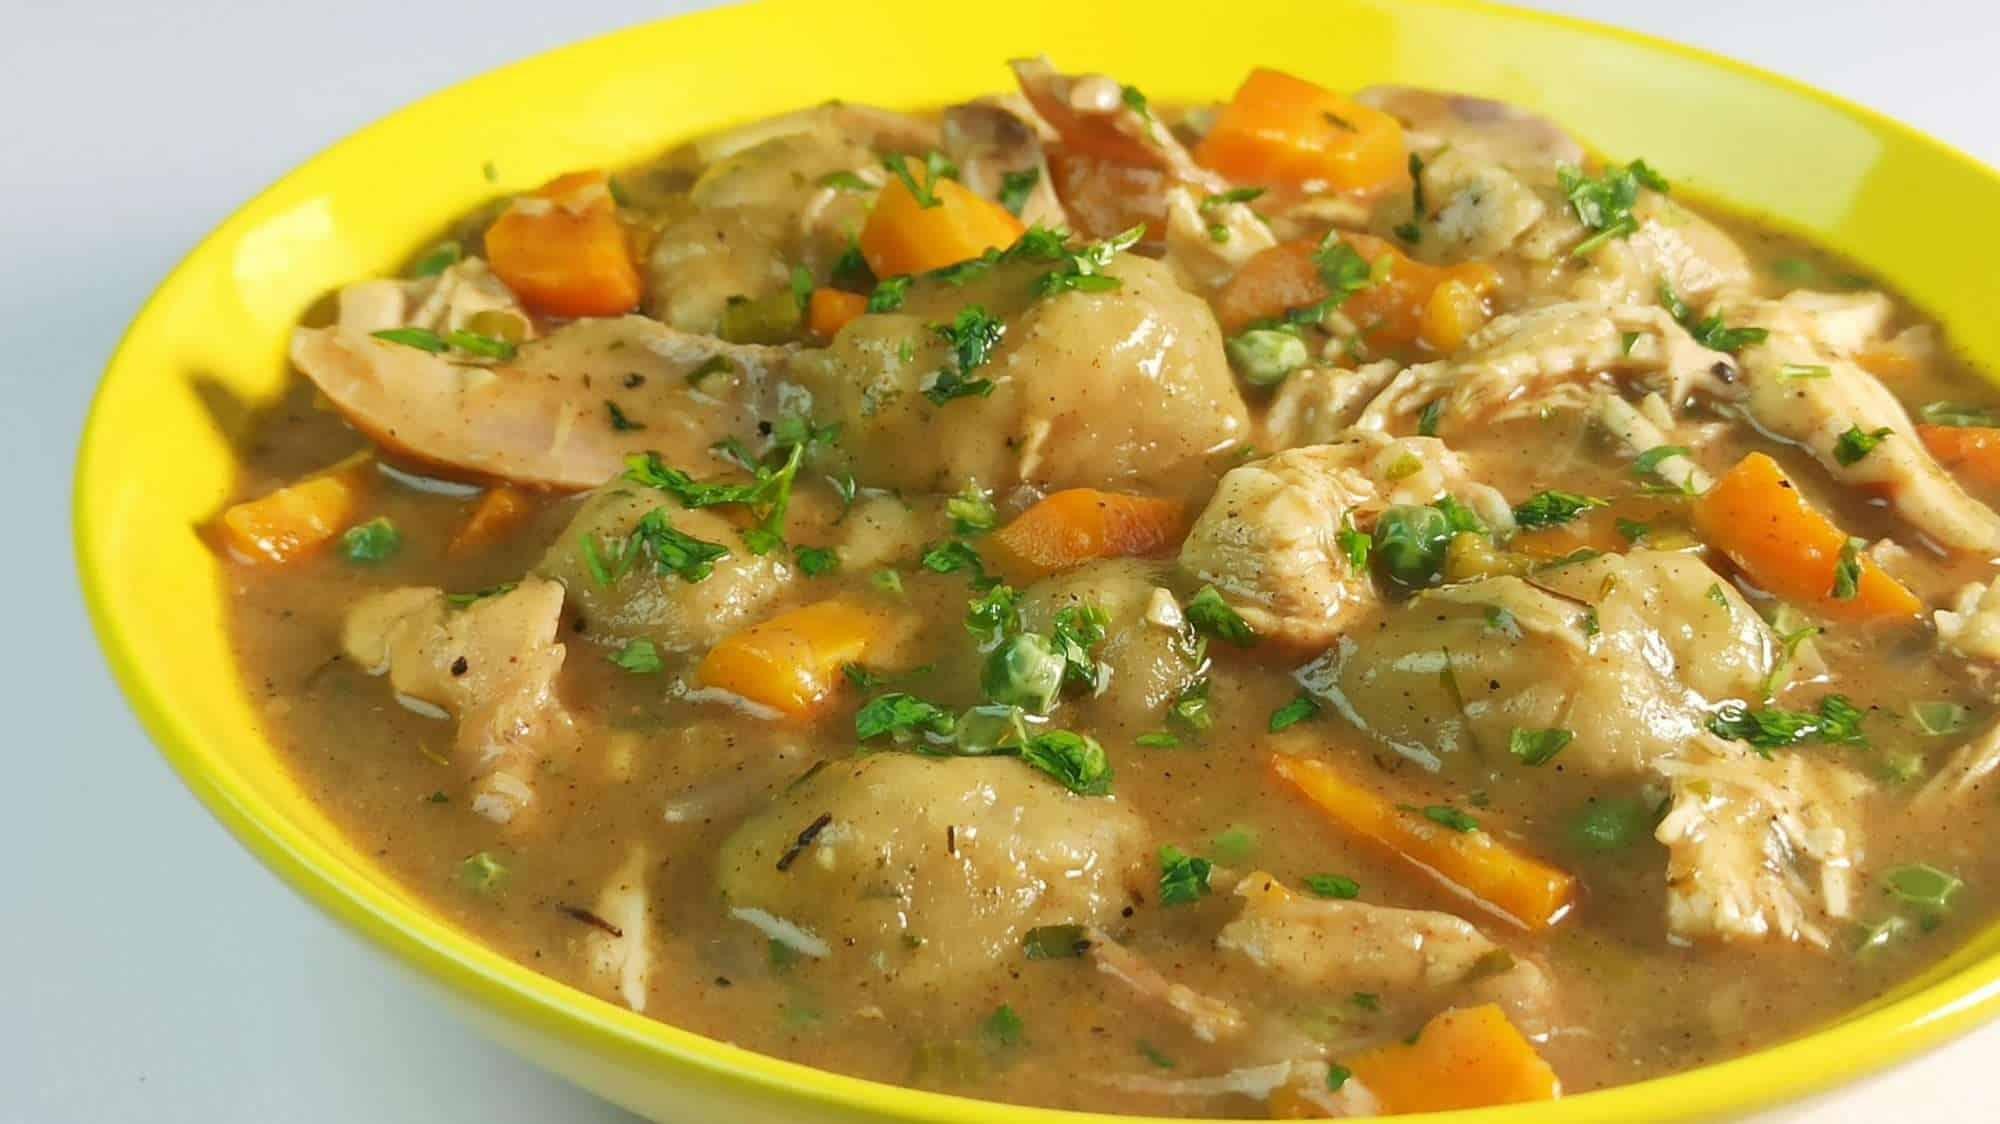 Easy Homemade Chicken and Dumplings